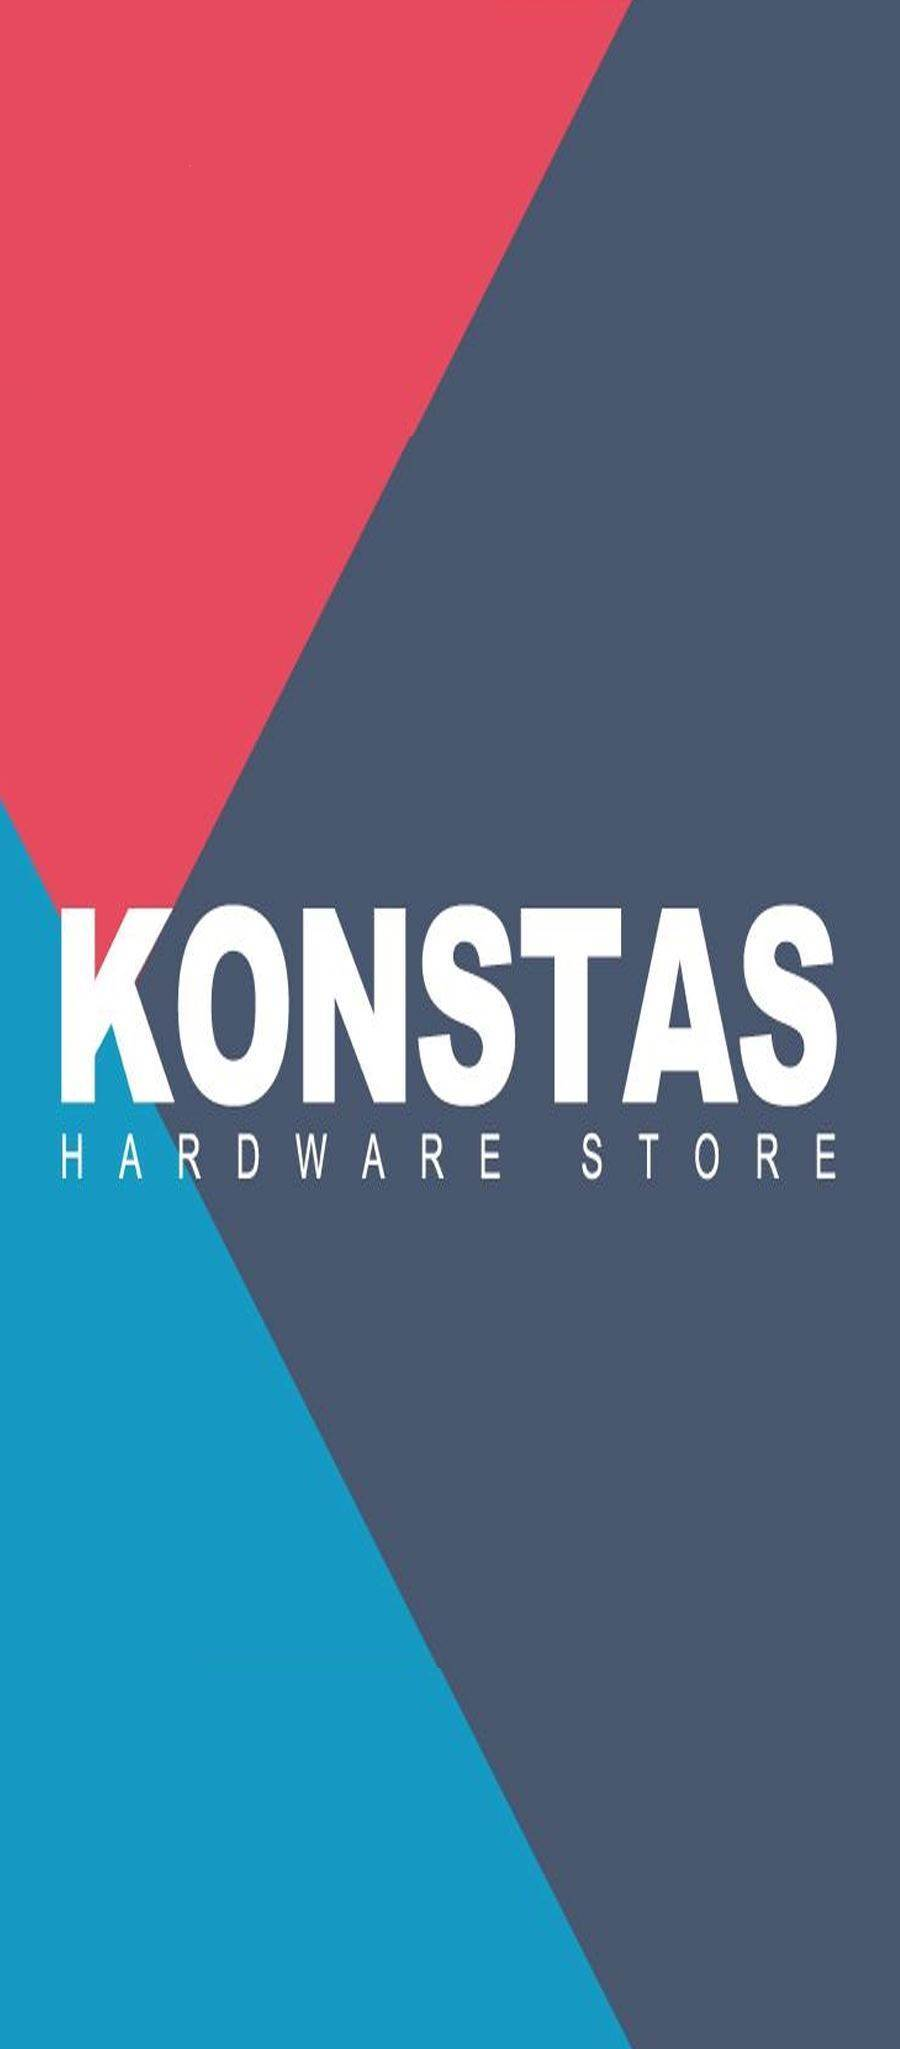 KONSTAS HARDWARE STORES